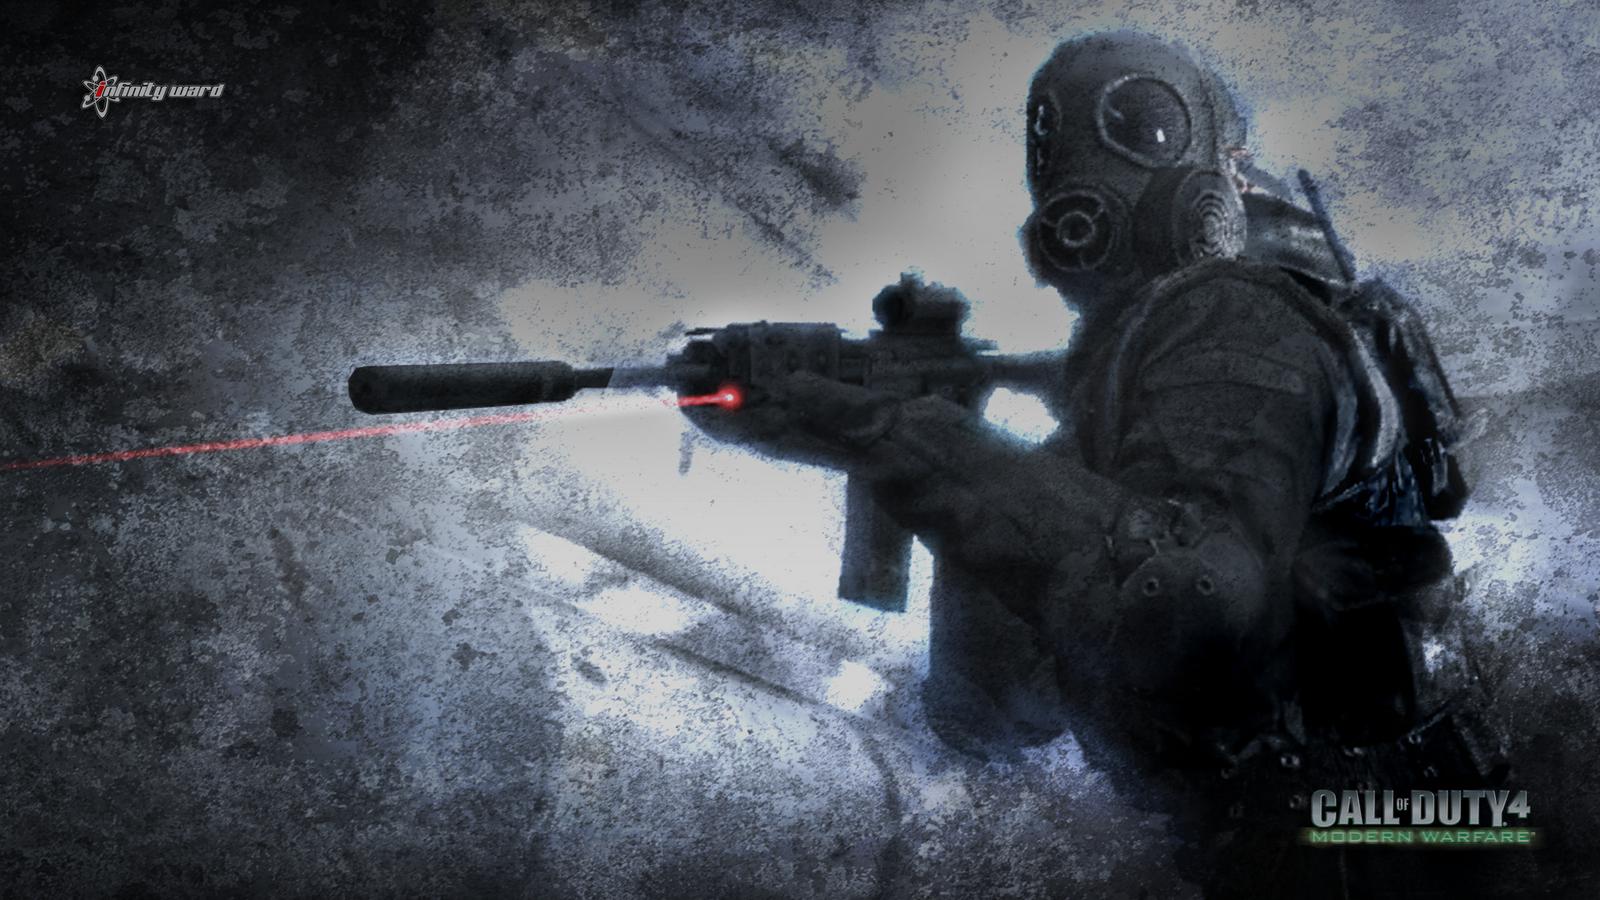 download Modern Warfare 4 HD Wallpapers Logos HD Video Game 1600x900